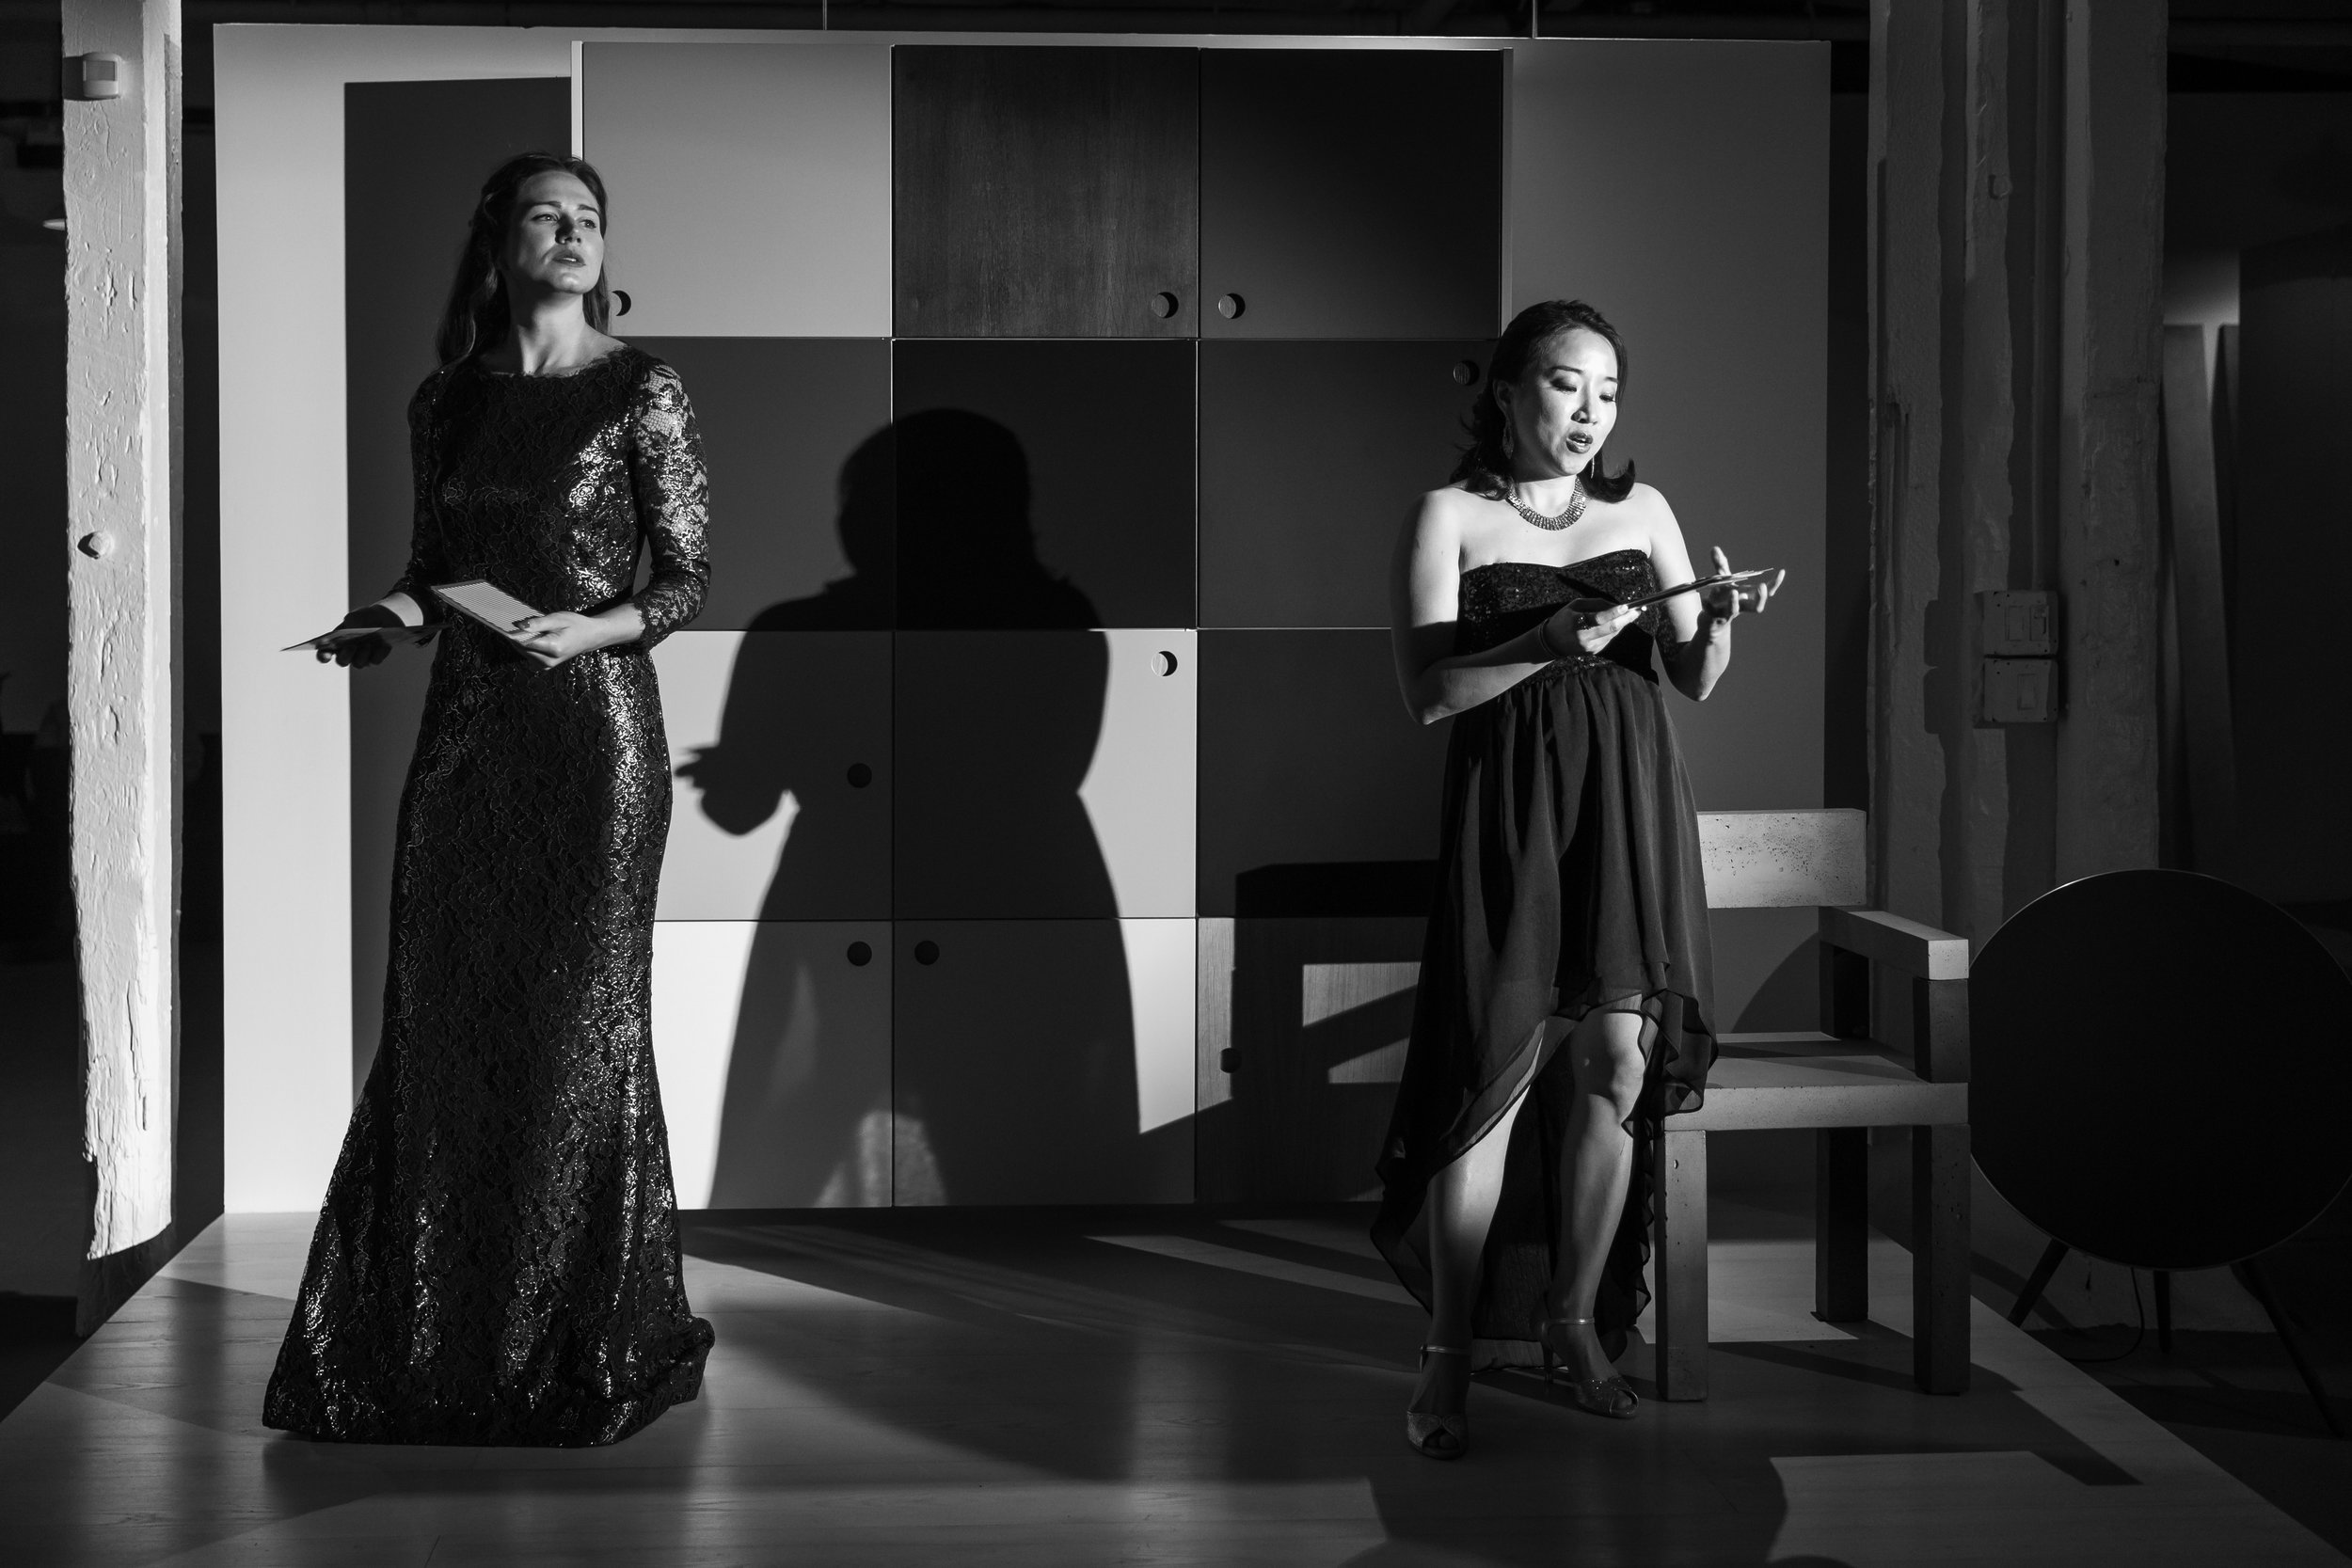 20171026 - Bare Opera's 3rd Annual Gala Event 0024.jpg